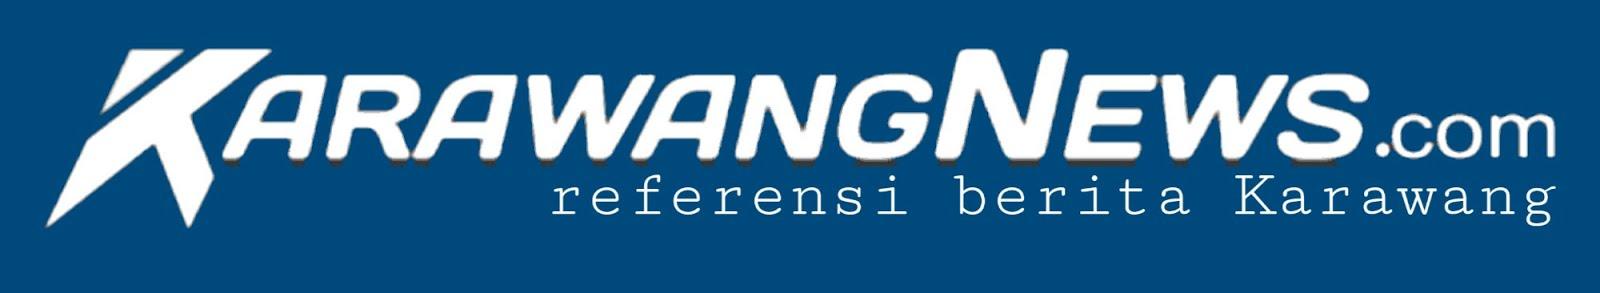 KarawangNews.com